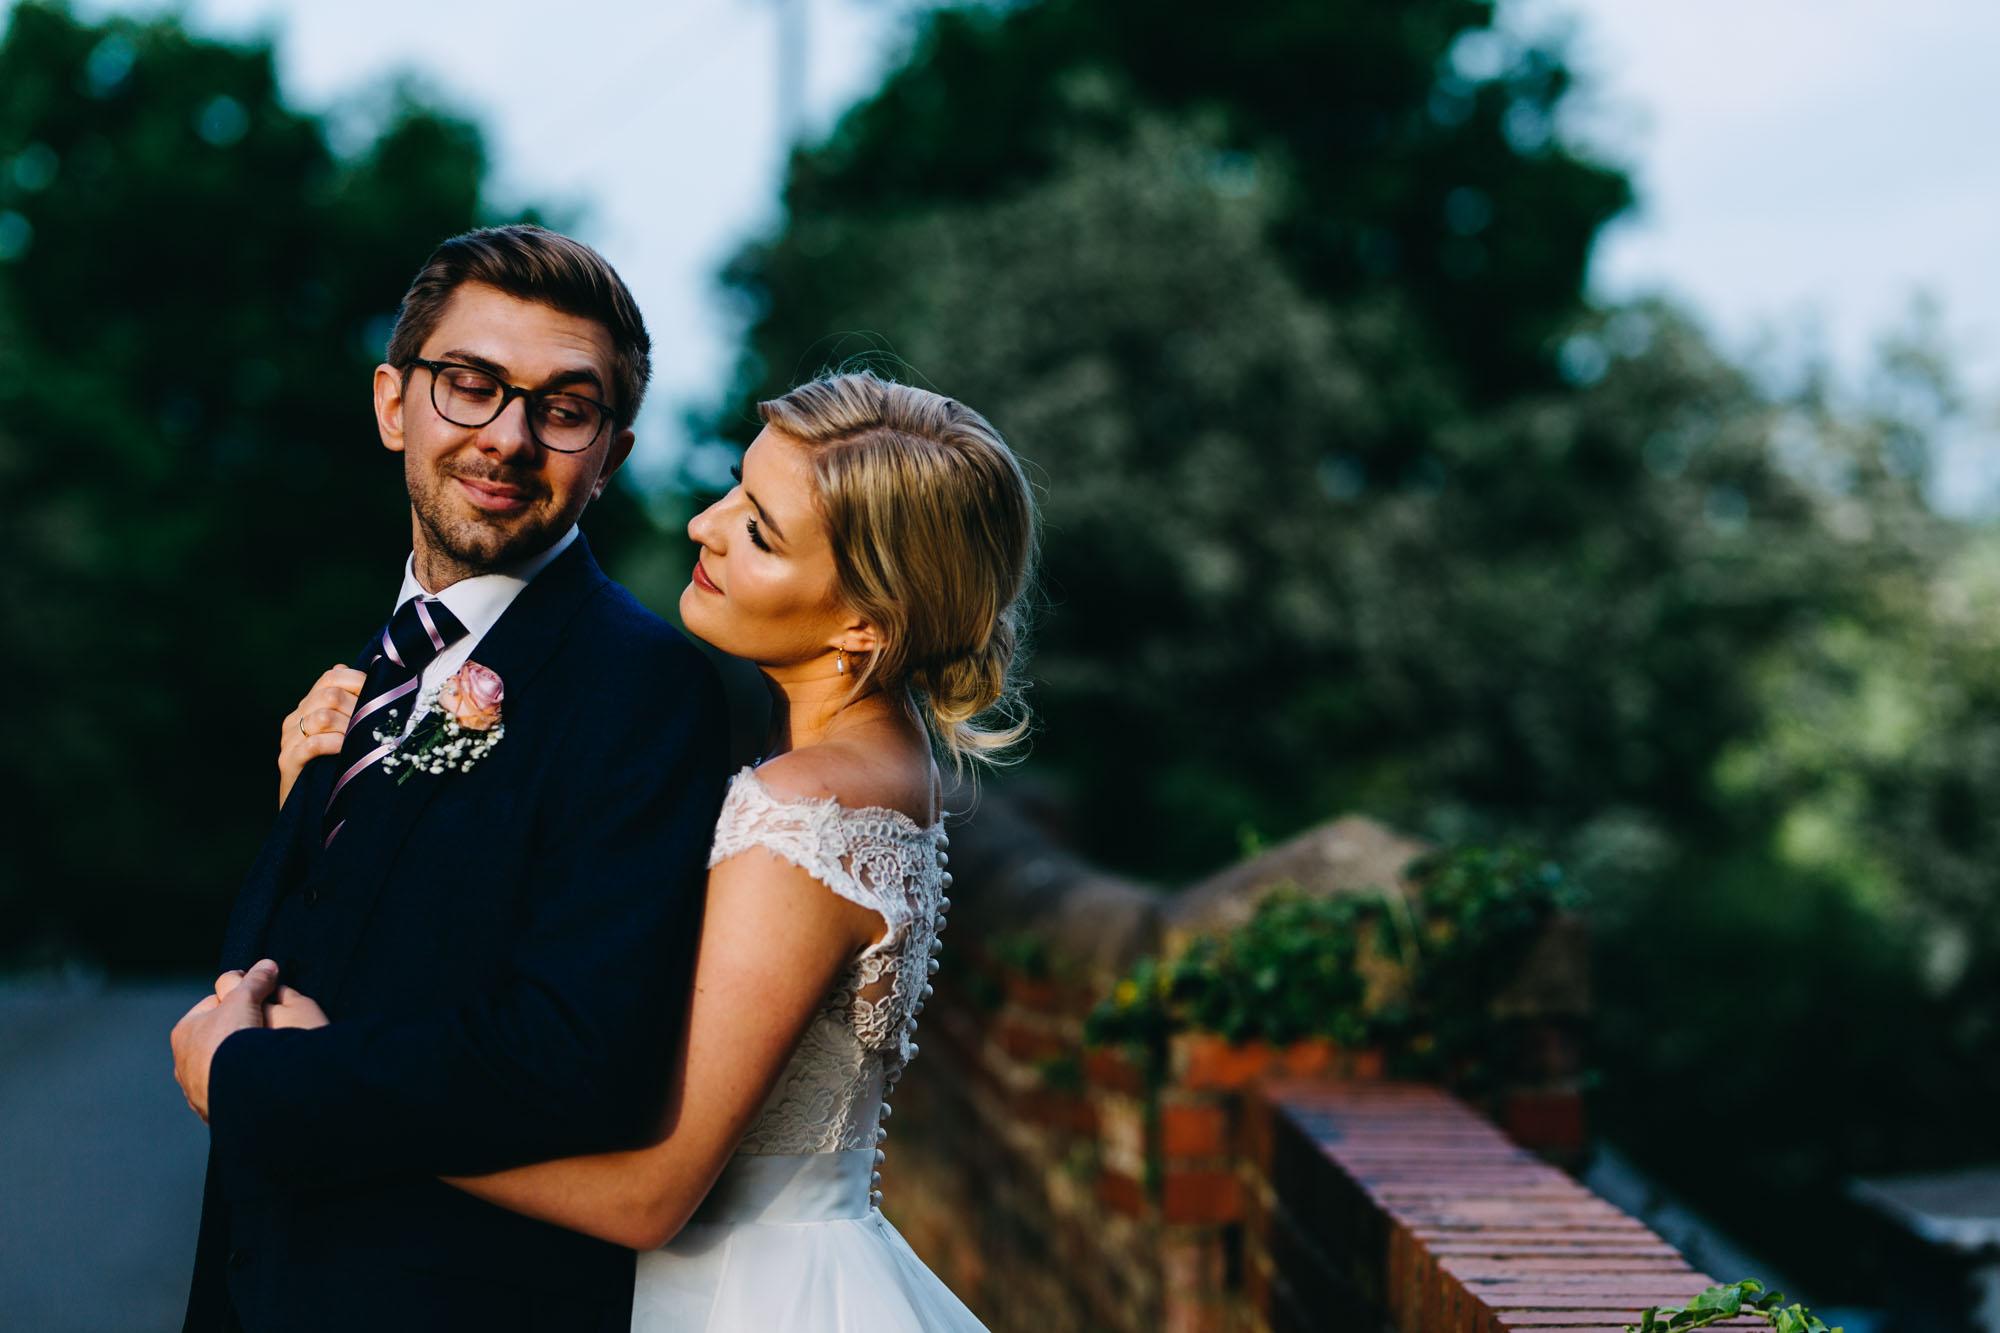 book-theme-wedding-dodmoor-house-58